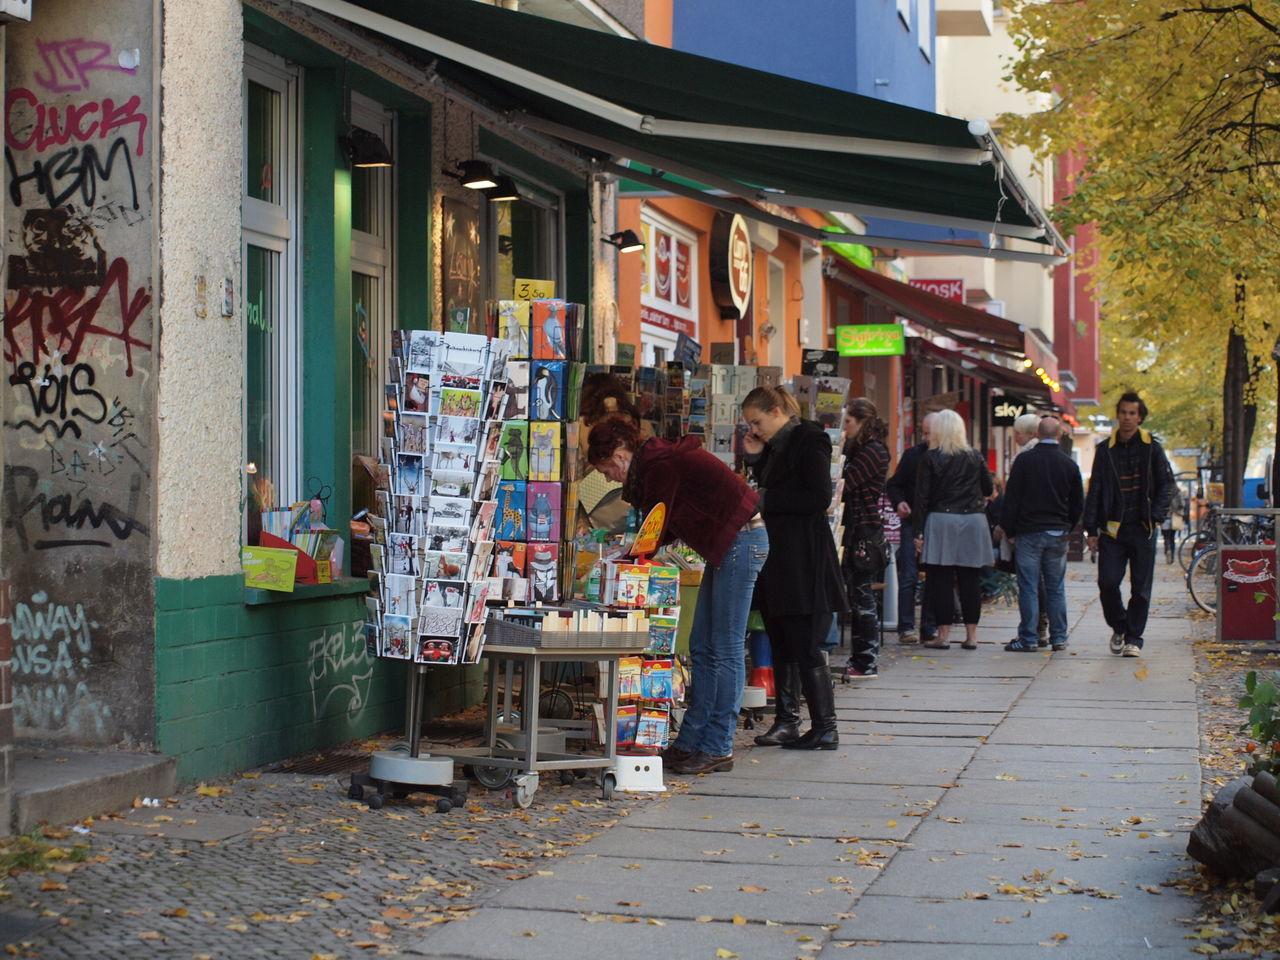 Book Shop Book Store City Men Outdoors People Retail  Shop Shopping Store Storefront Street Streetart Women